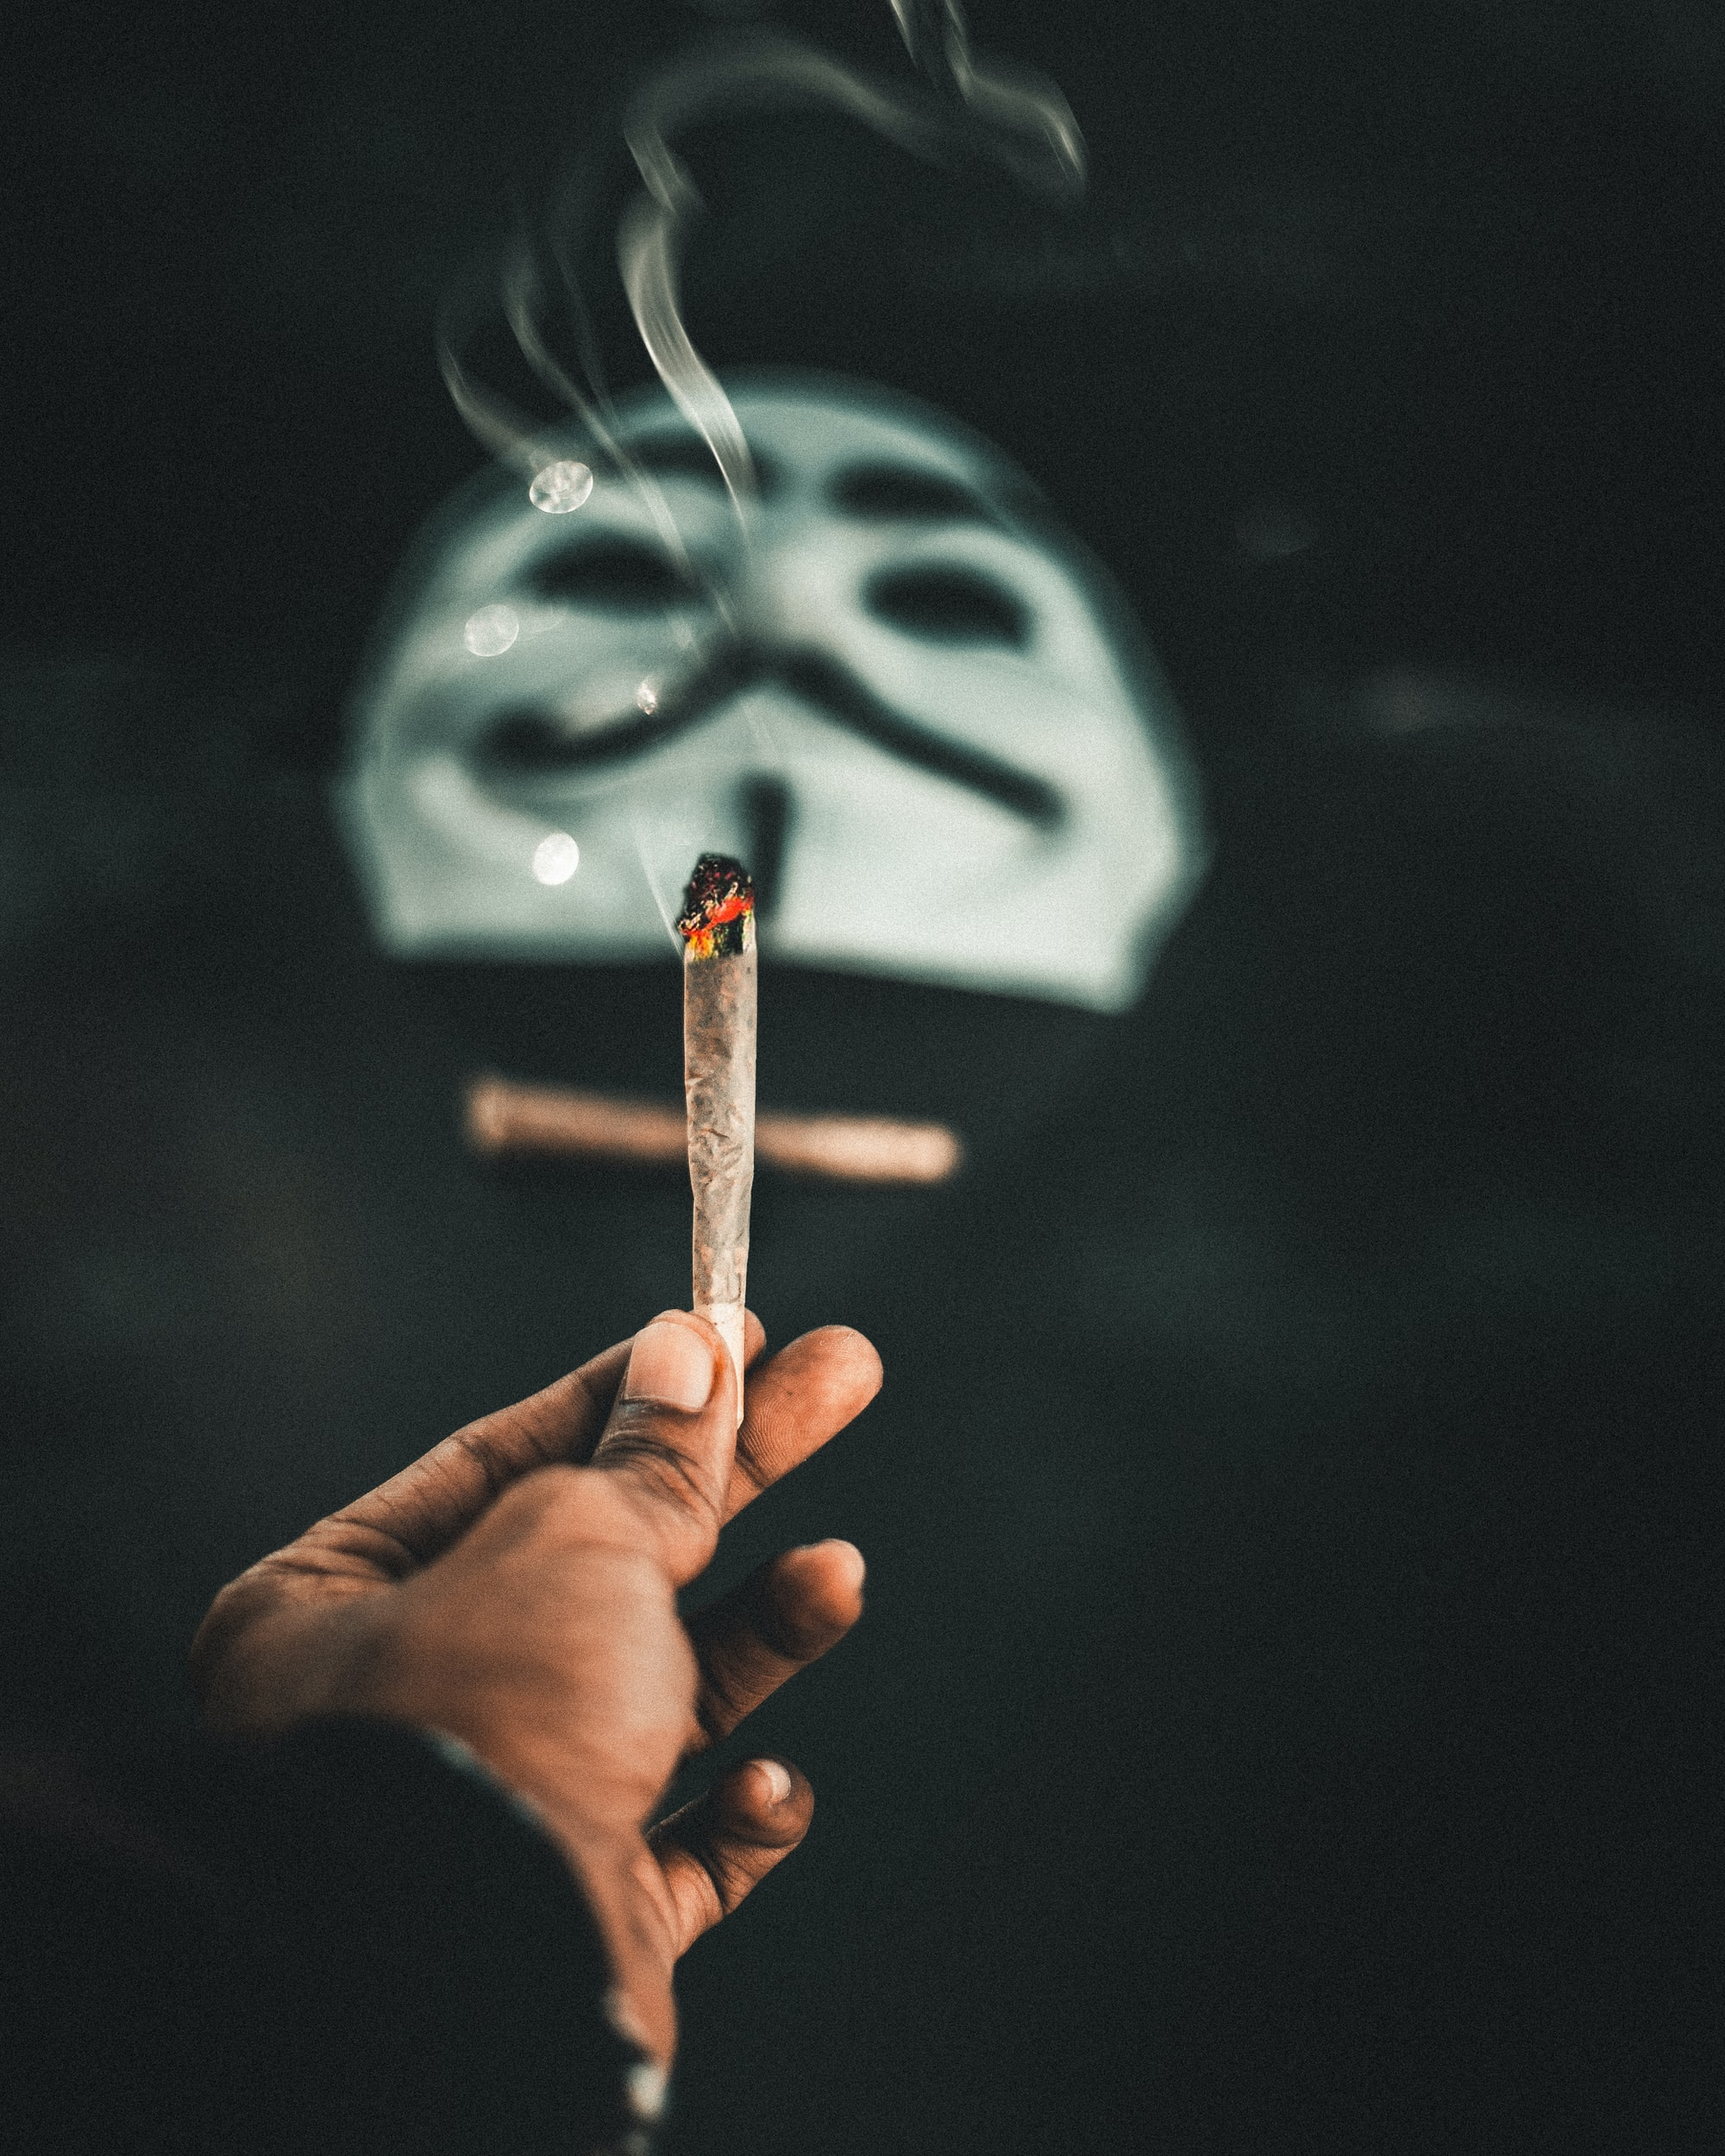 Prawdziwa historia marihuany